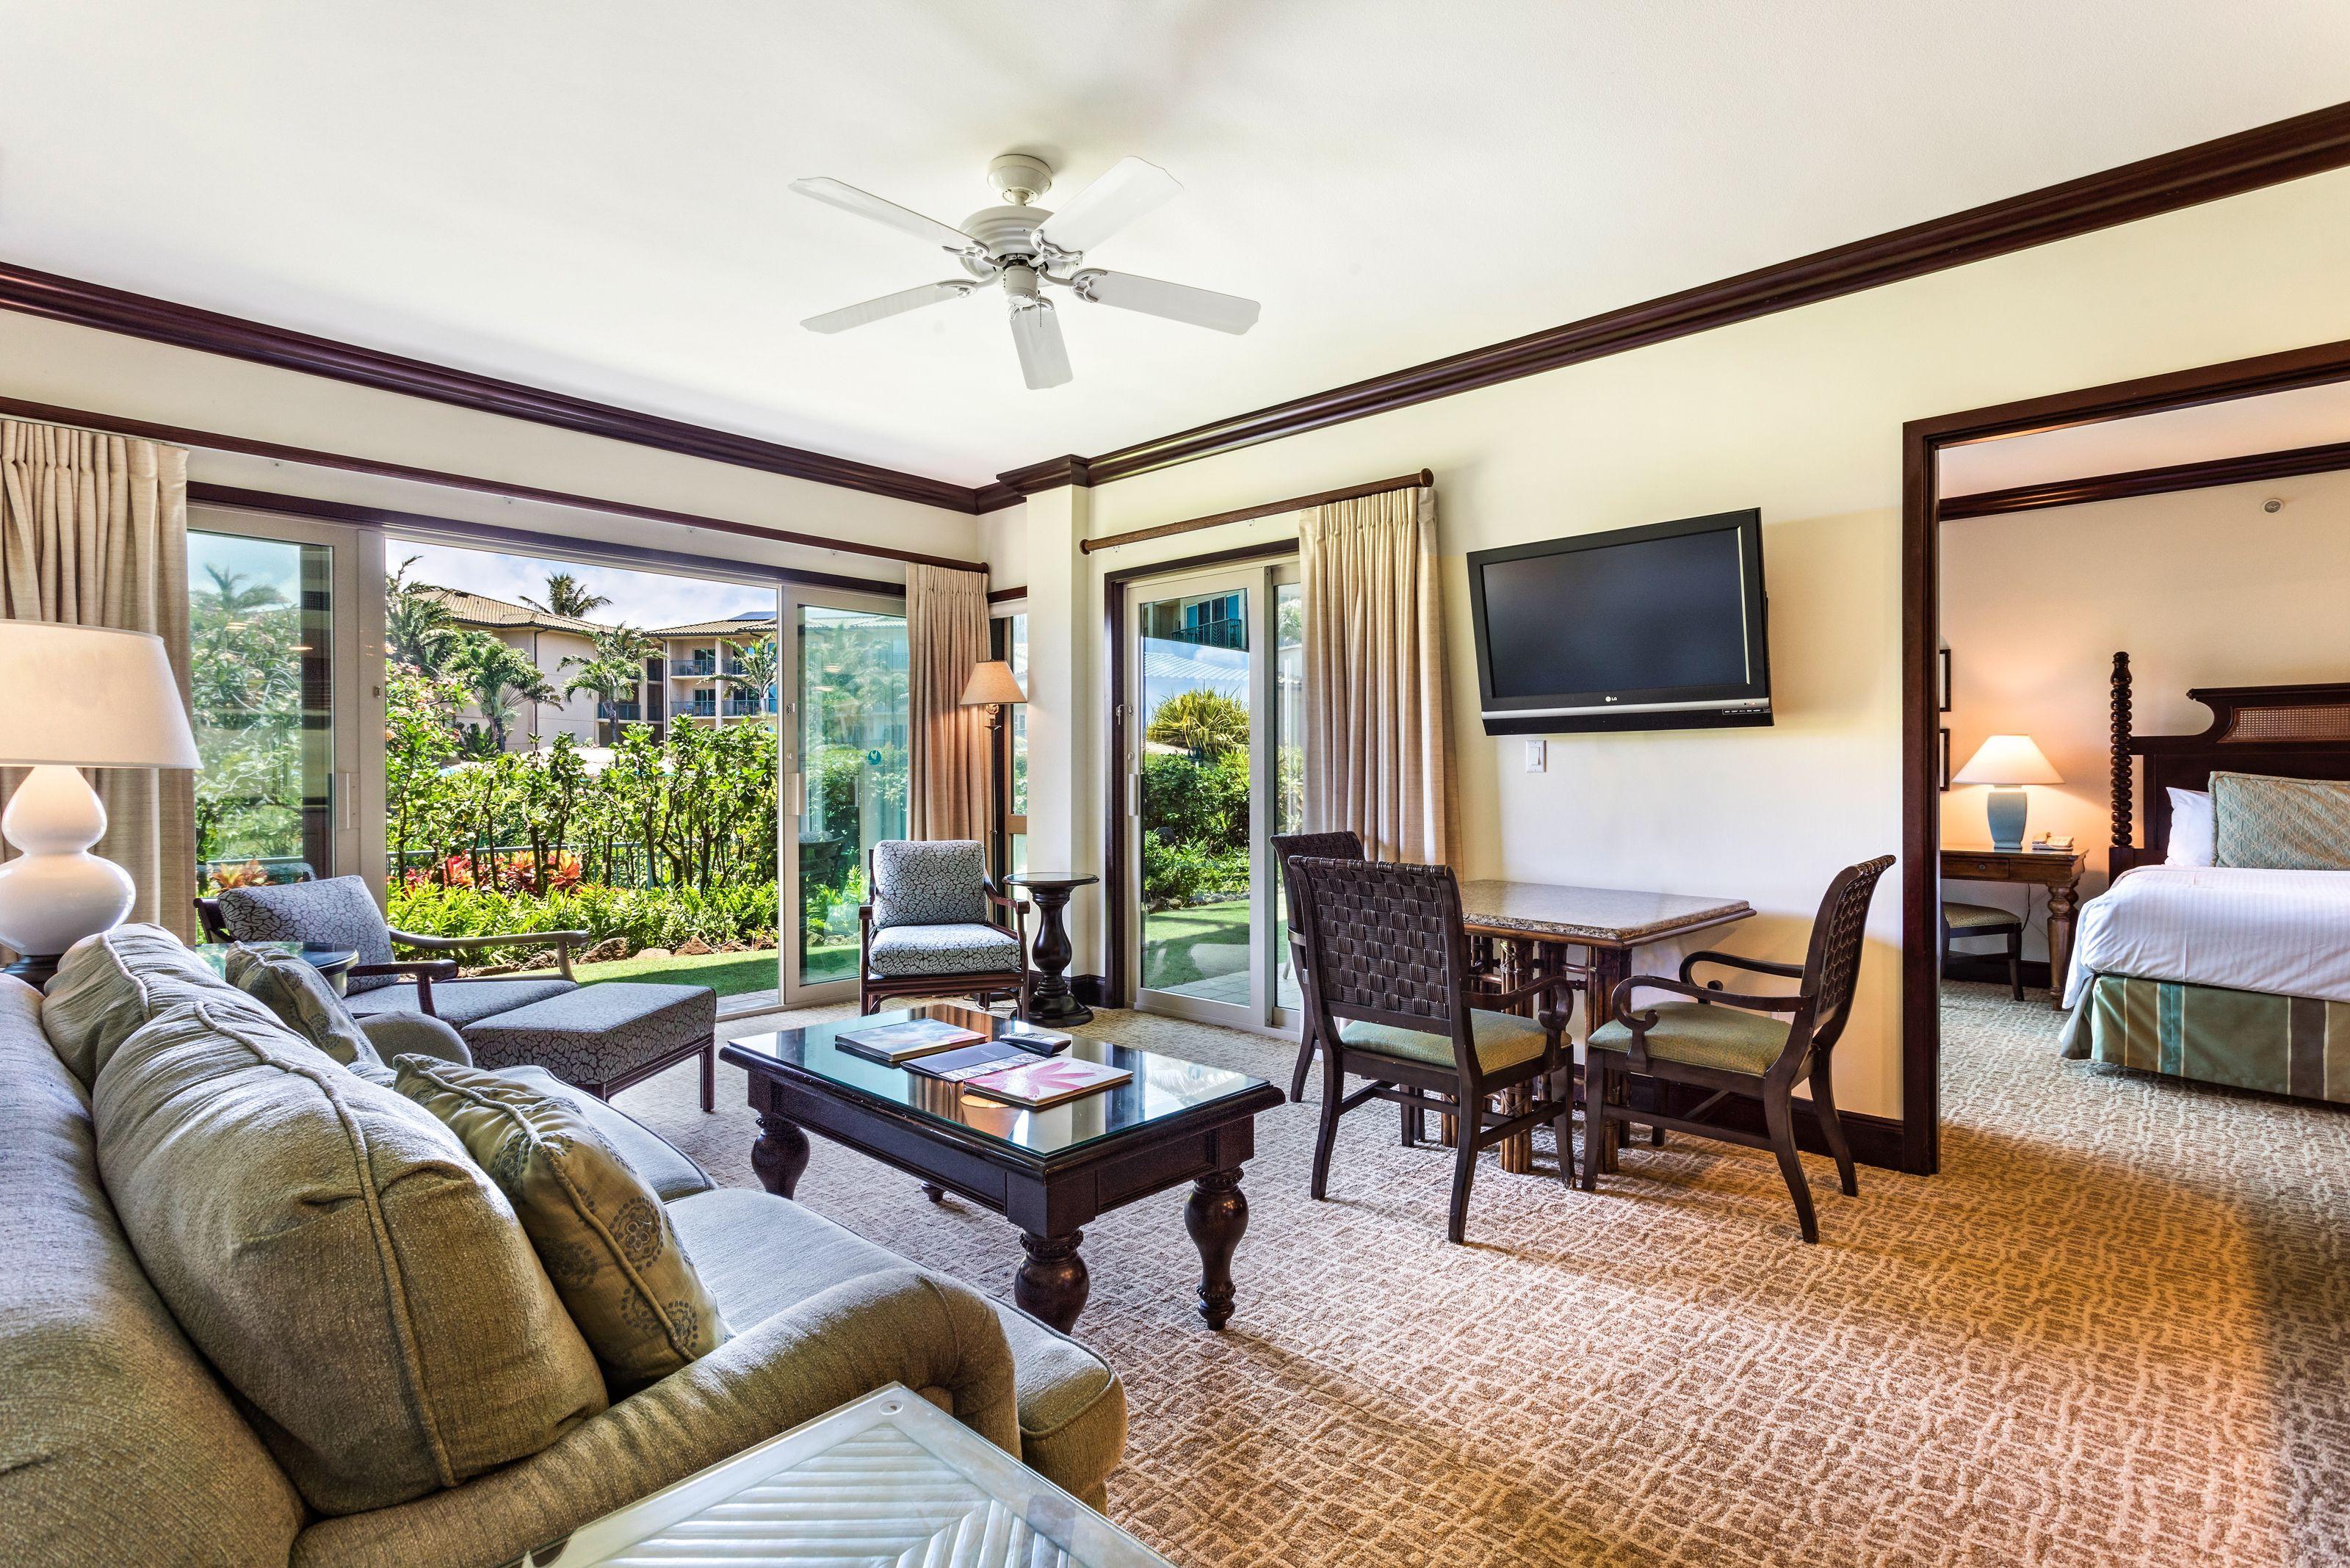 Courtesy of Waipouli Beach Resorts & Spa Kauai by Outrigger / Expedia